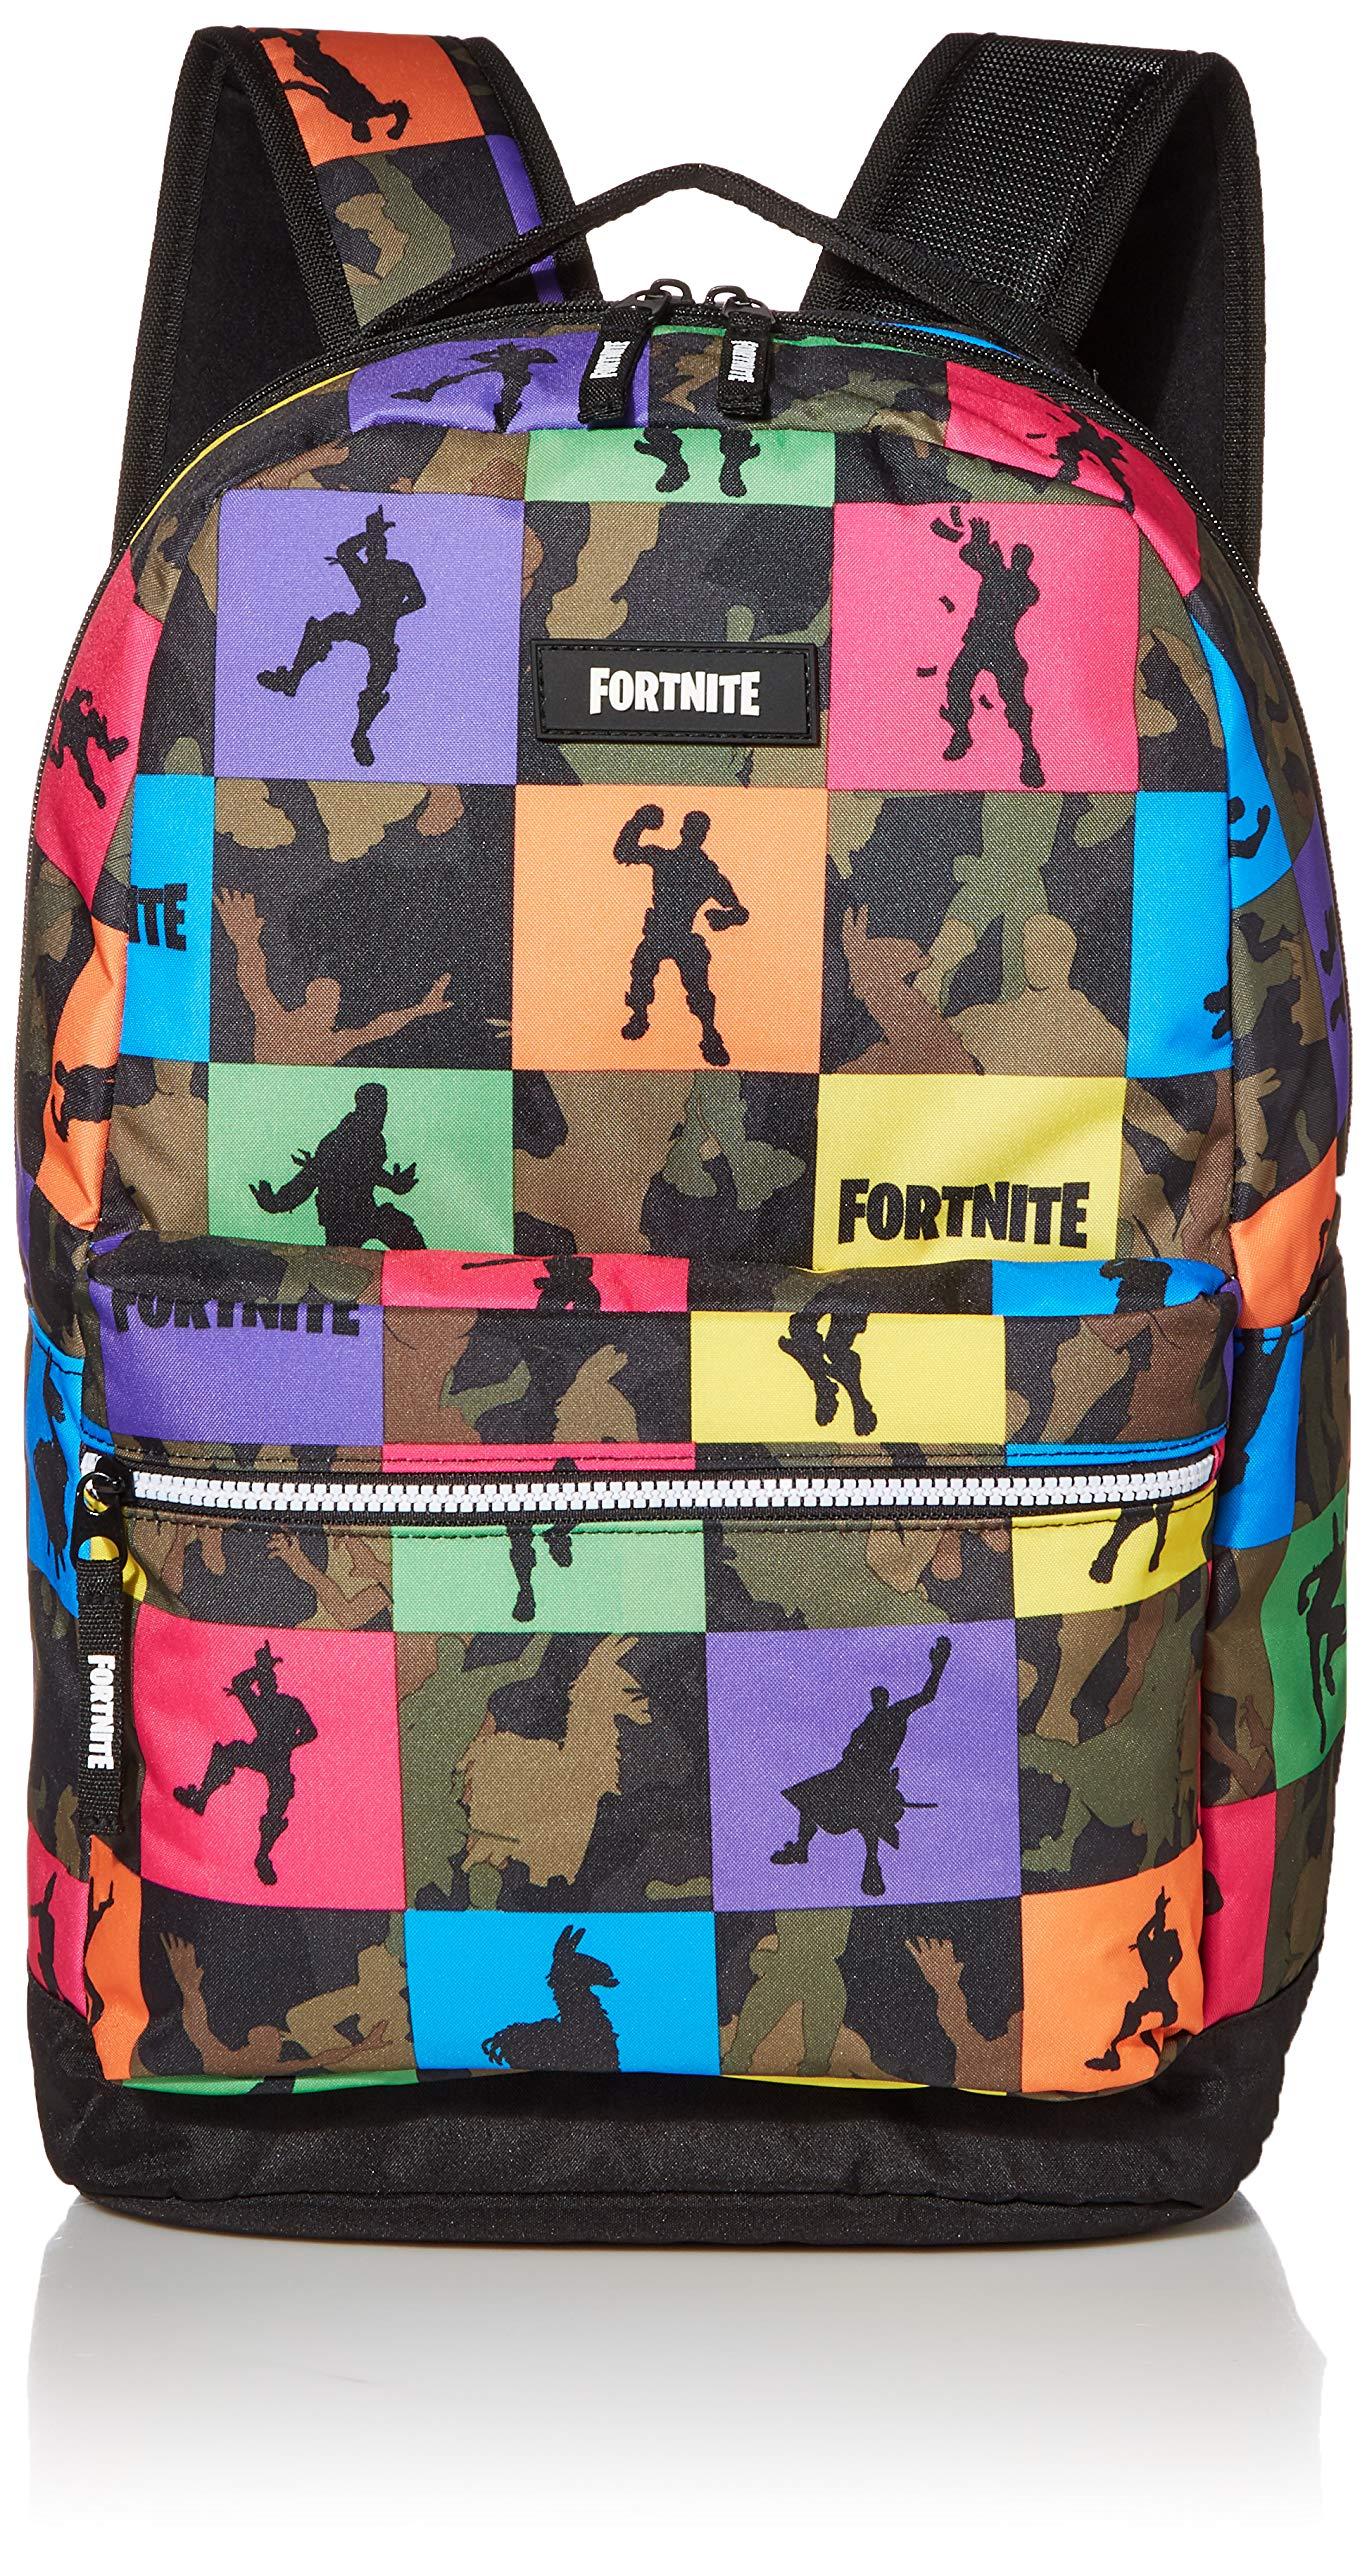 FORTNITE Kids' Big Multiplier Backpack, Camo, One Size by Fortnite